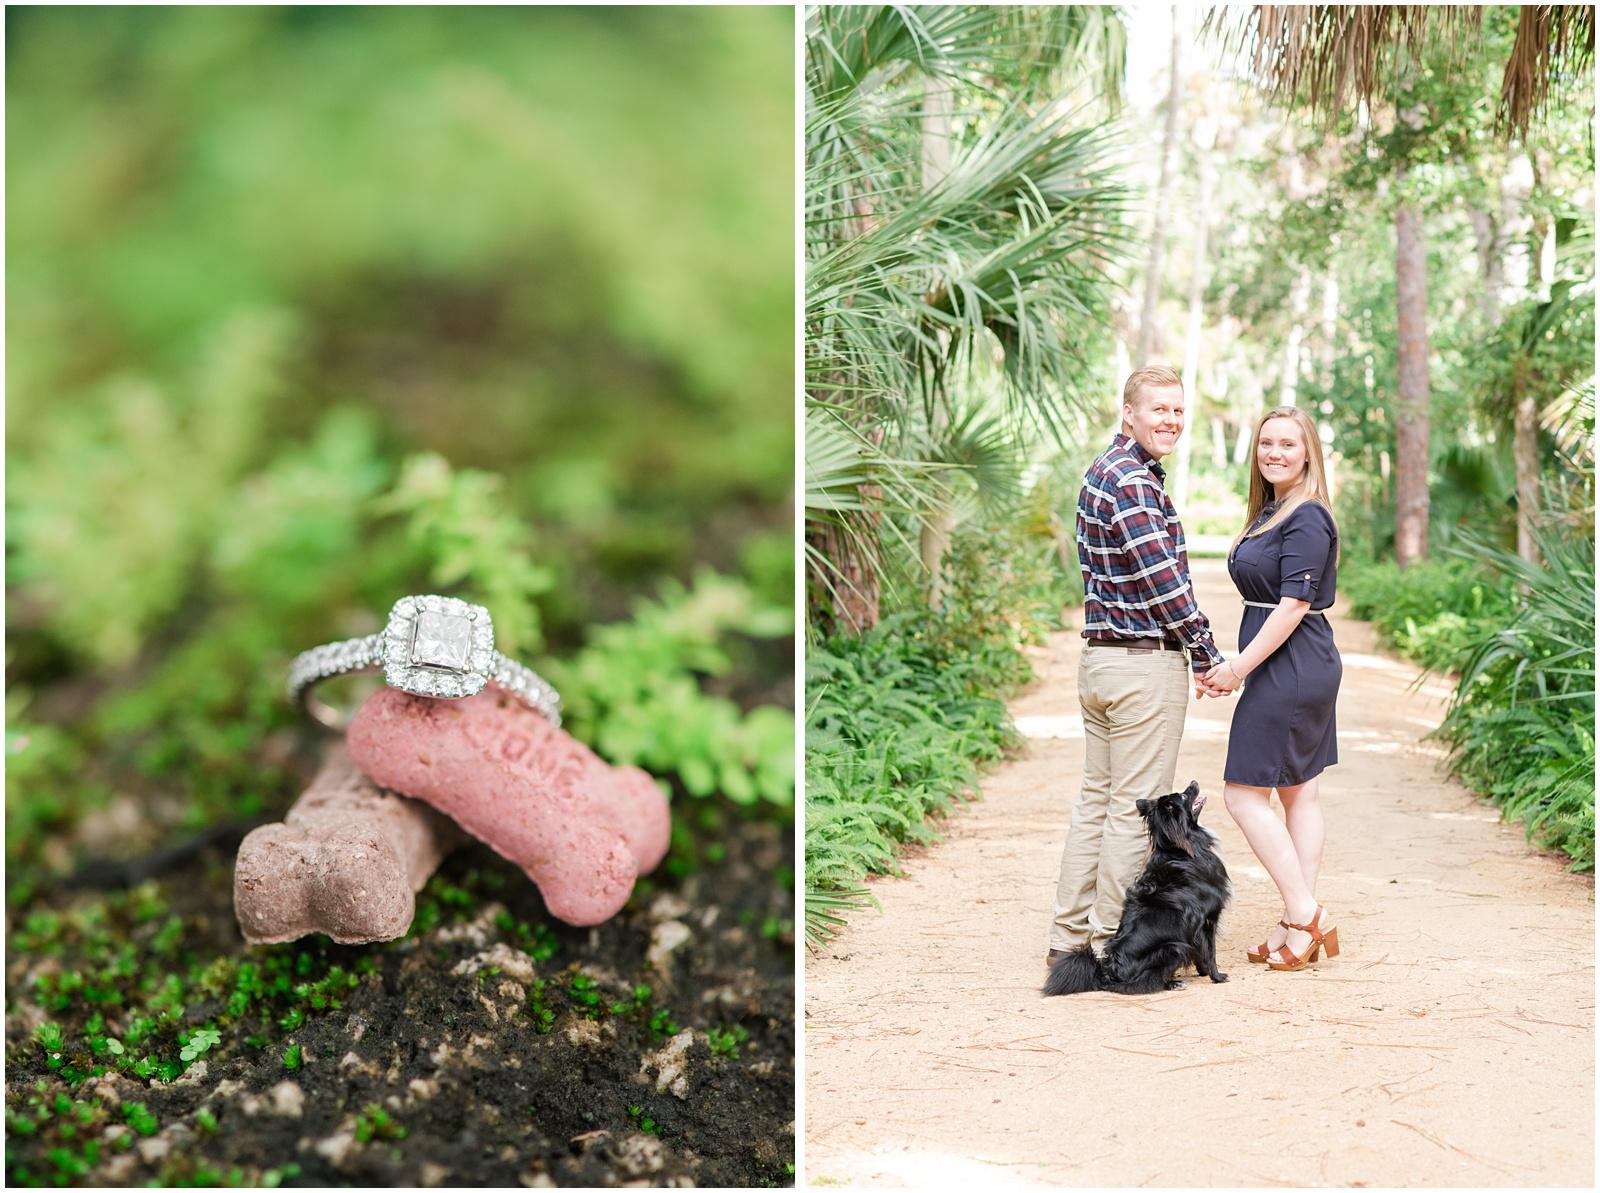 Palm Coast_Washington Oaks Garden_State Park_Engagement_Portraits_8.jpg